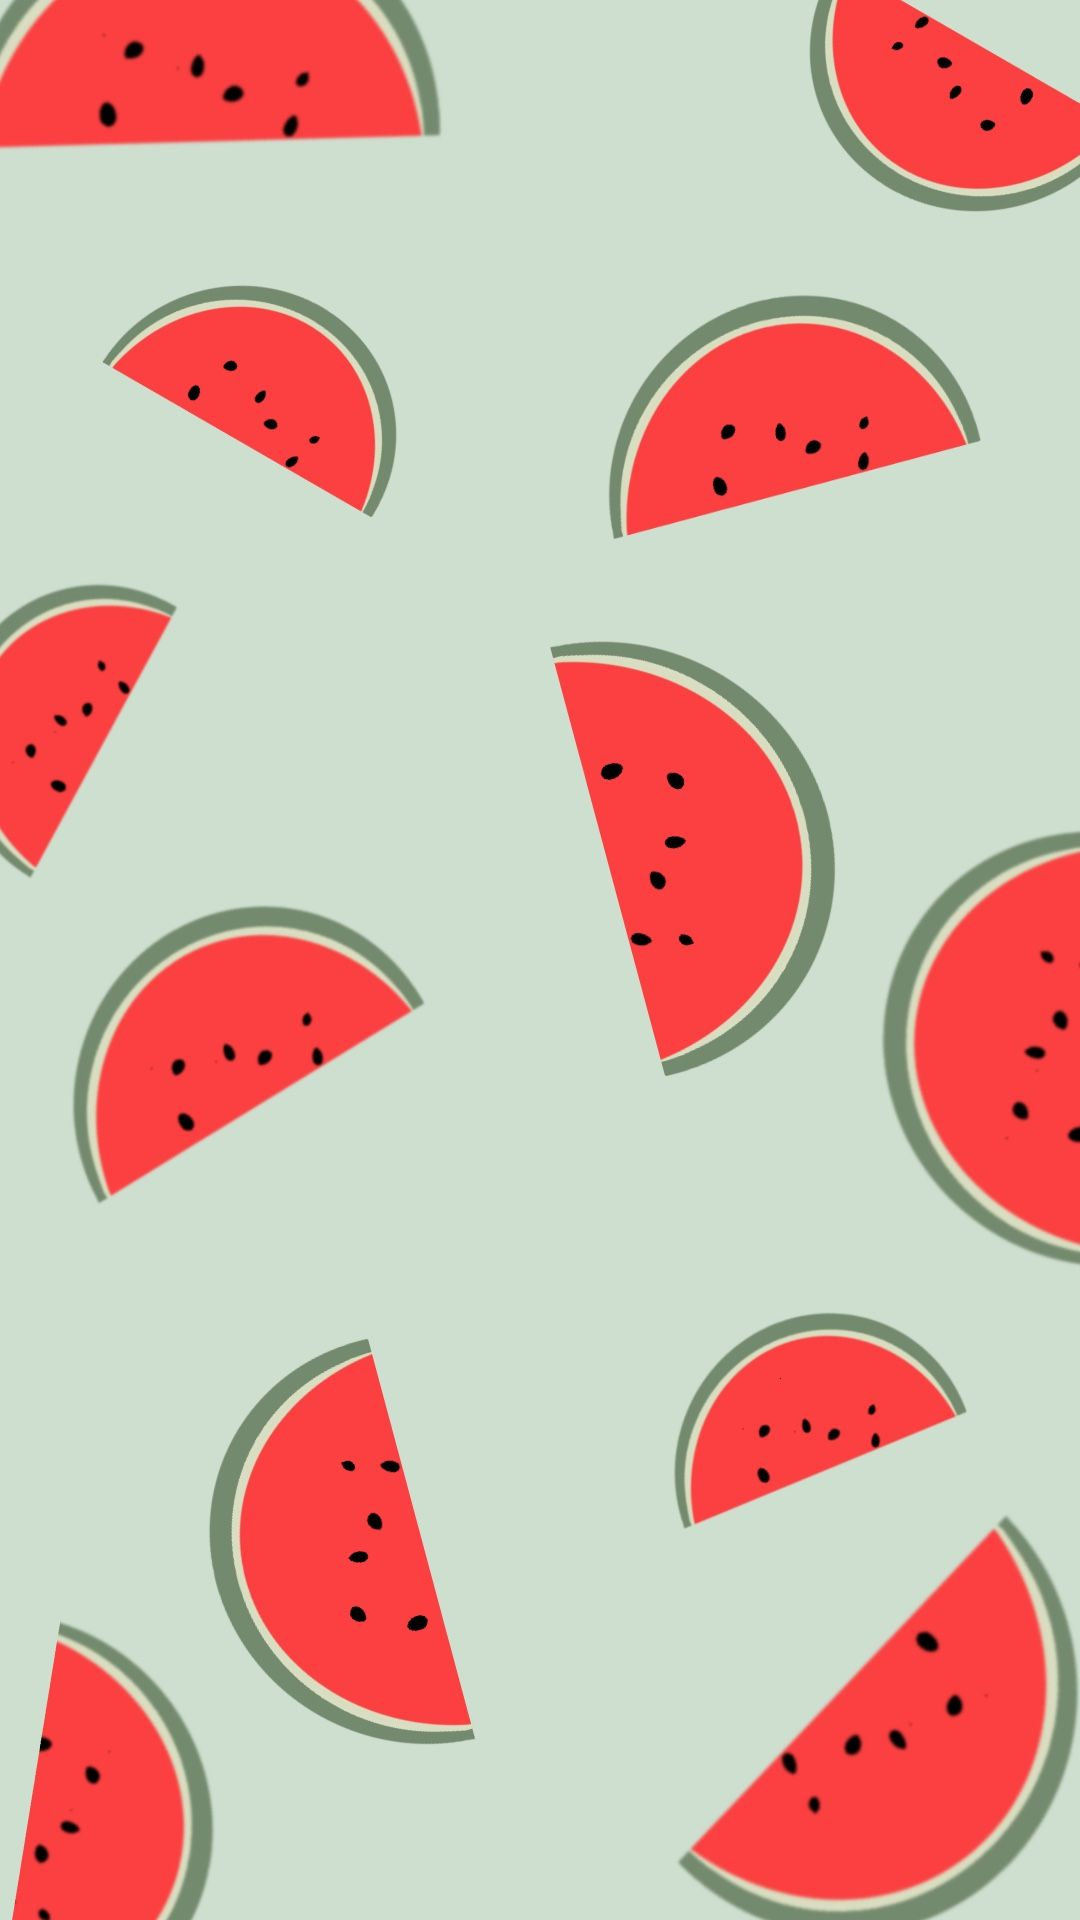 Watermelon Wallpaper Watermelon Wallpaper Dog Line Art Cute Backgrounds For Iphone